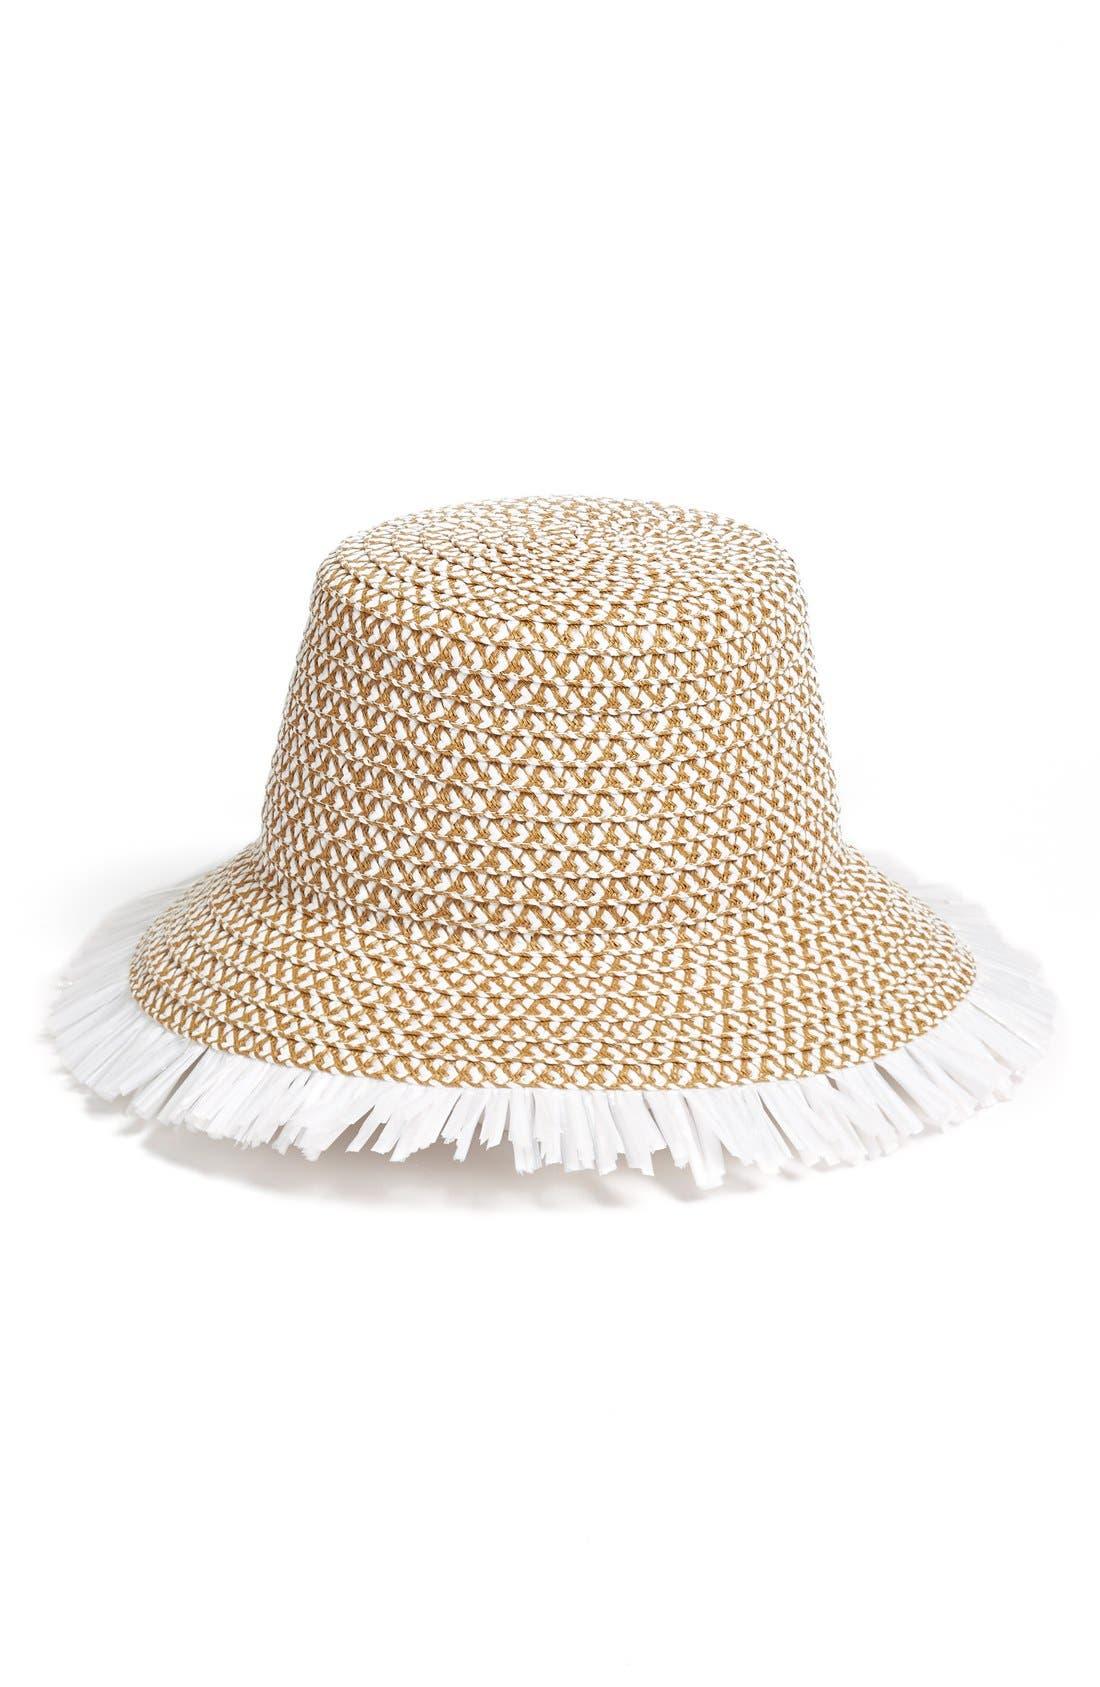 'TIKI' BUCKET HAT - WHITE